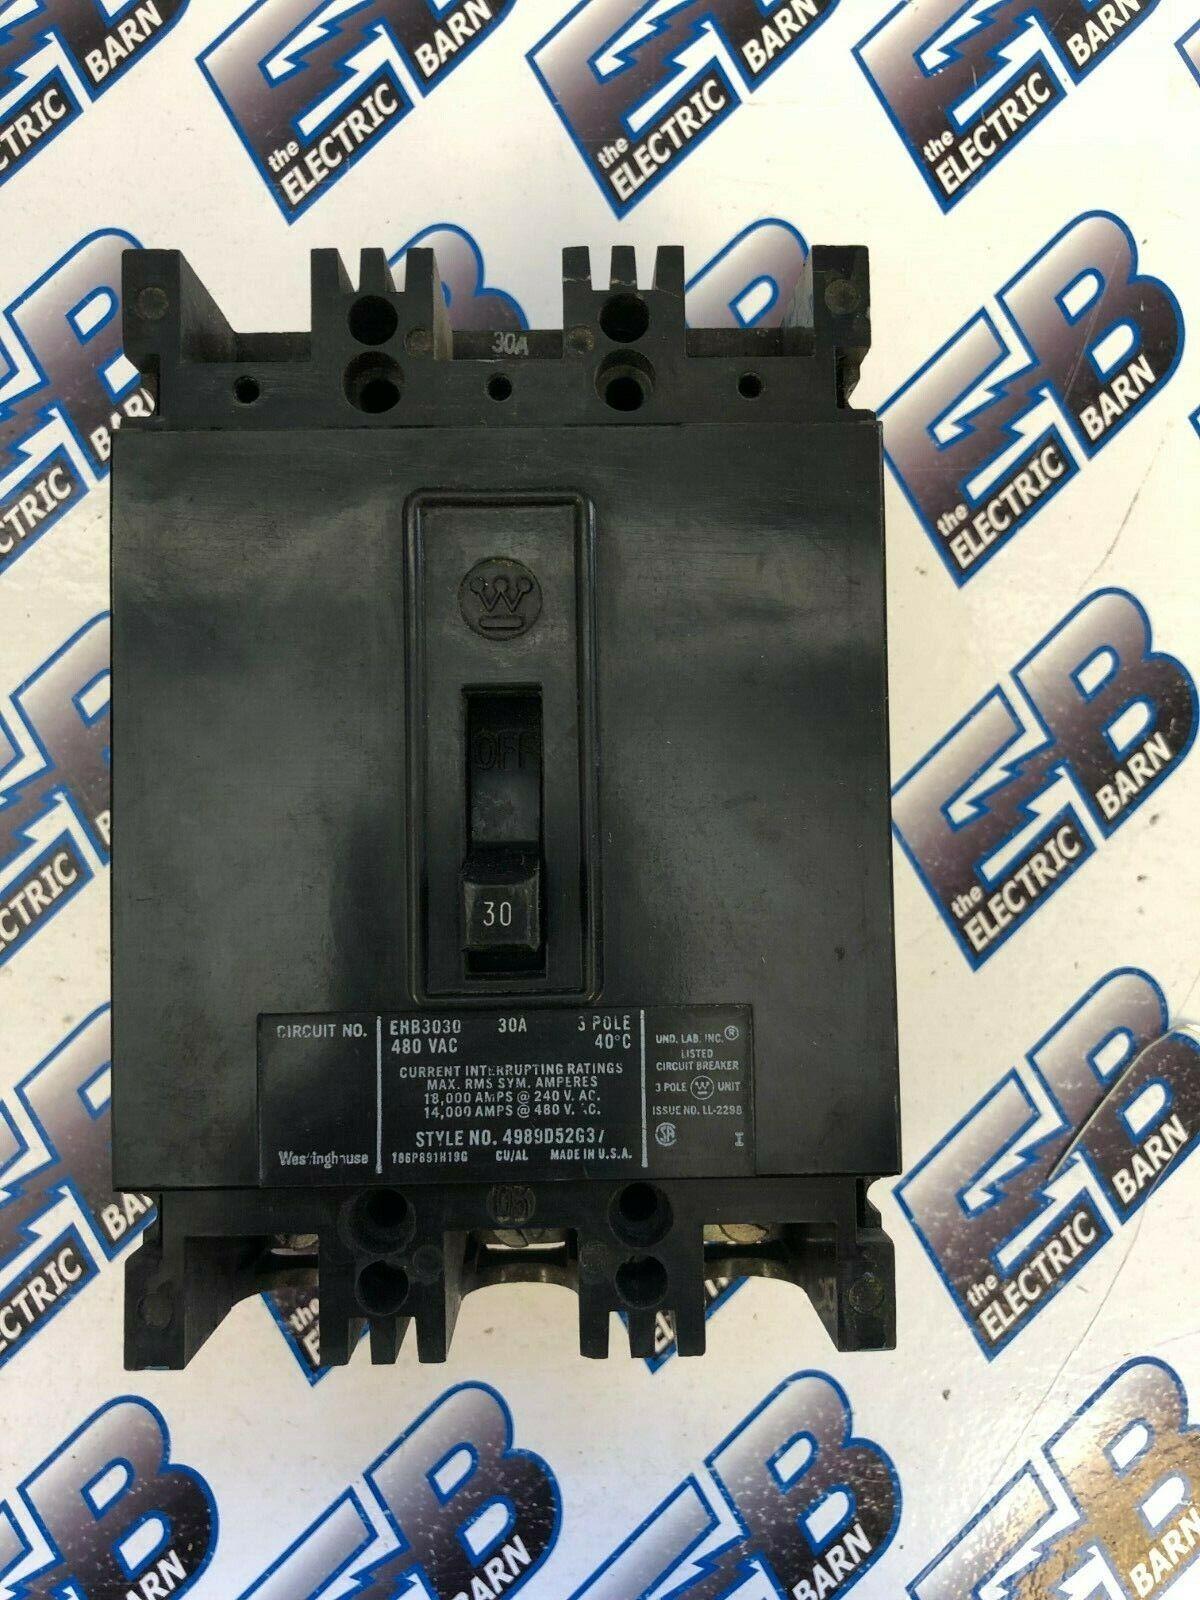 Westinghouse EHB3030 WARRANTY 30 Amp 3 POLE 480 VOLT Circuit Breaker